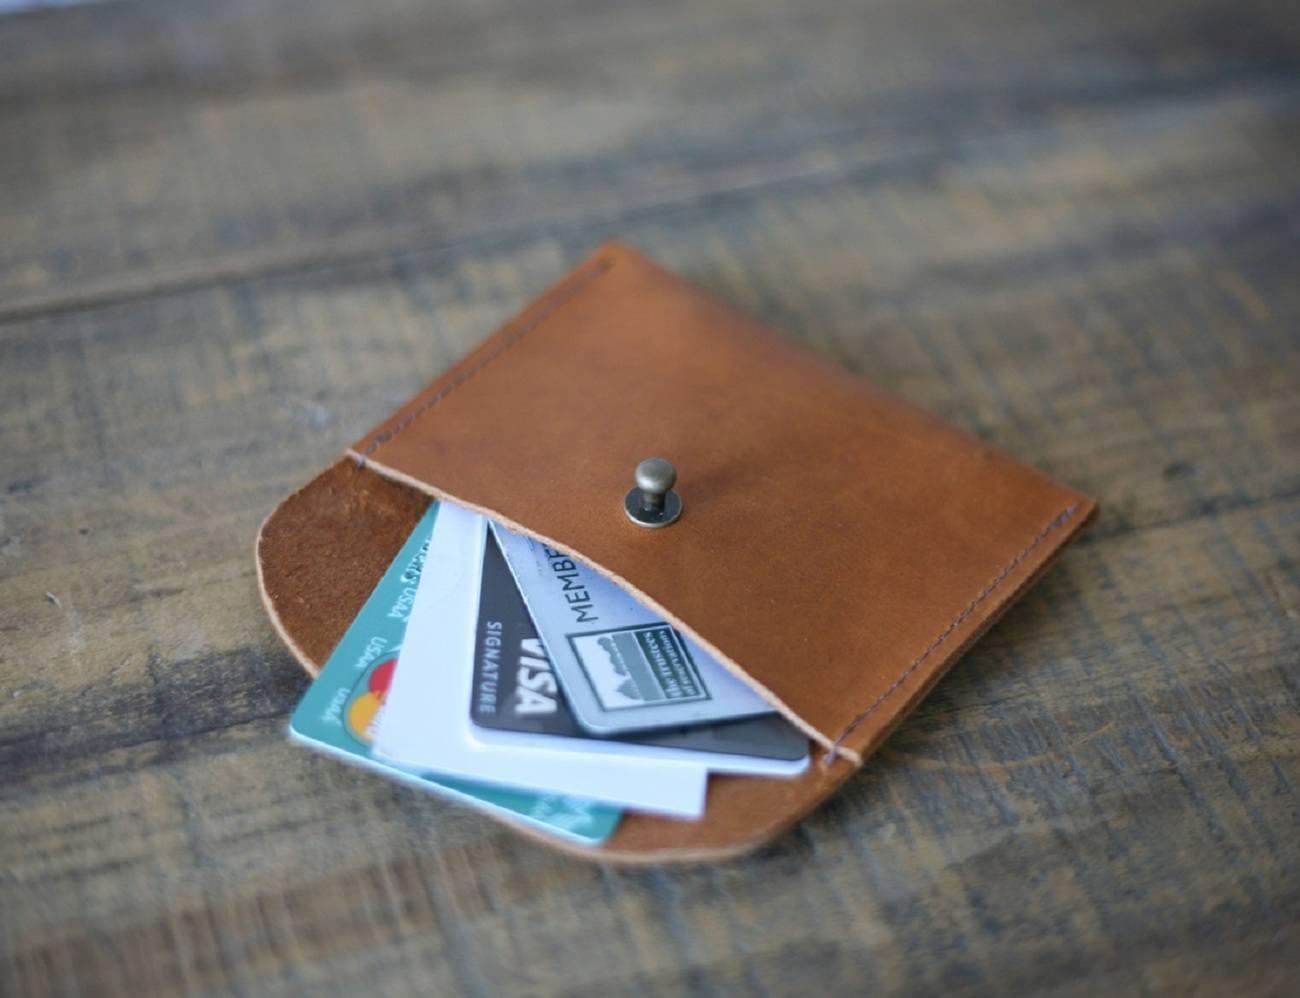 Elliot+Wallet+By+Forestbound